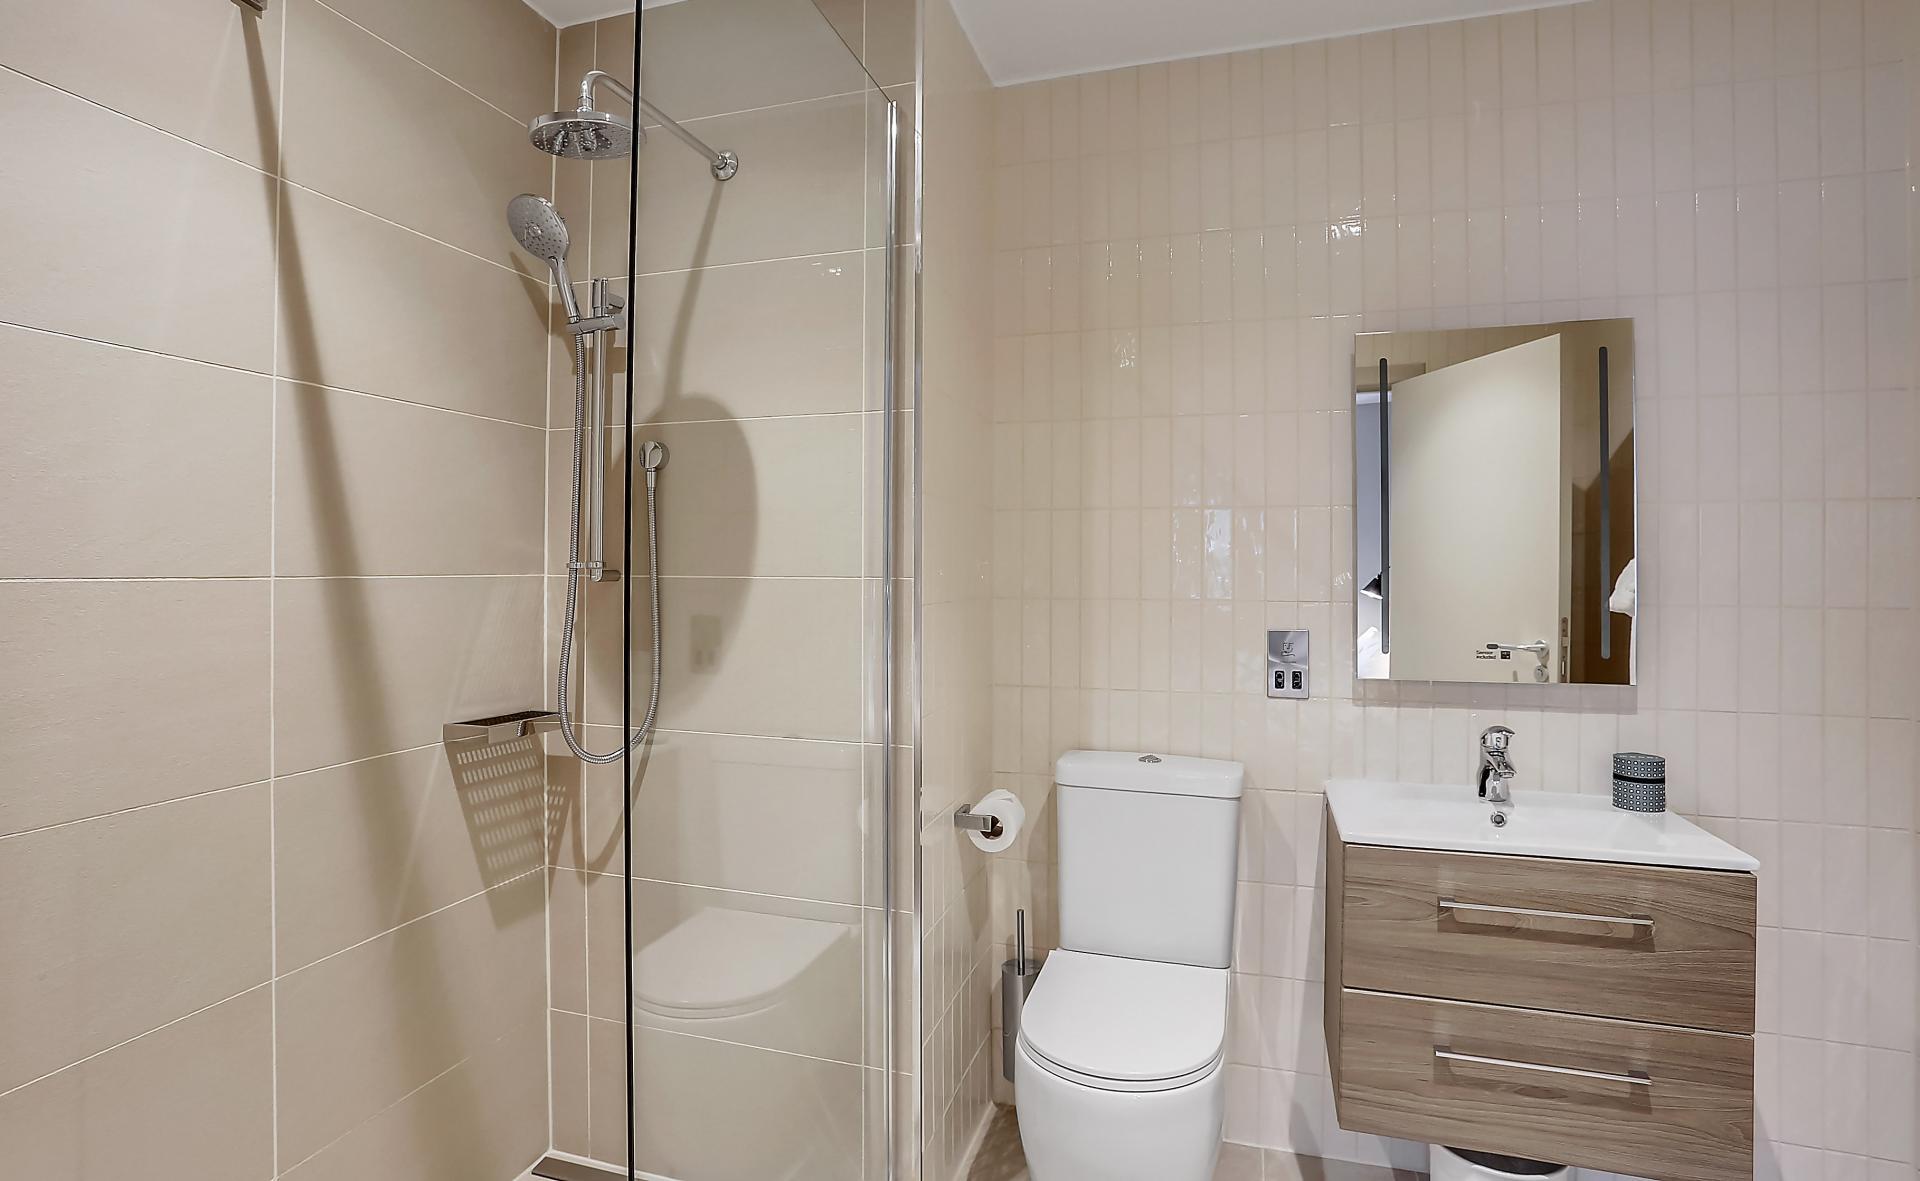 Bathroom at Native Edinburgh Apartments, Centre, Edinburgh - Citybase Apartments